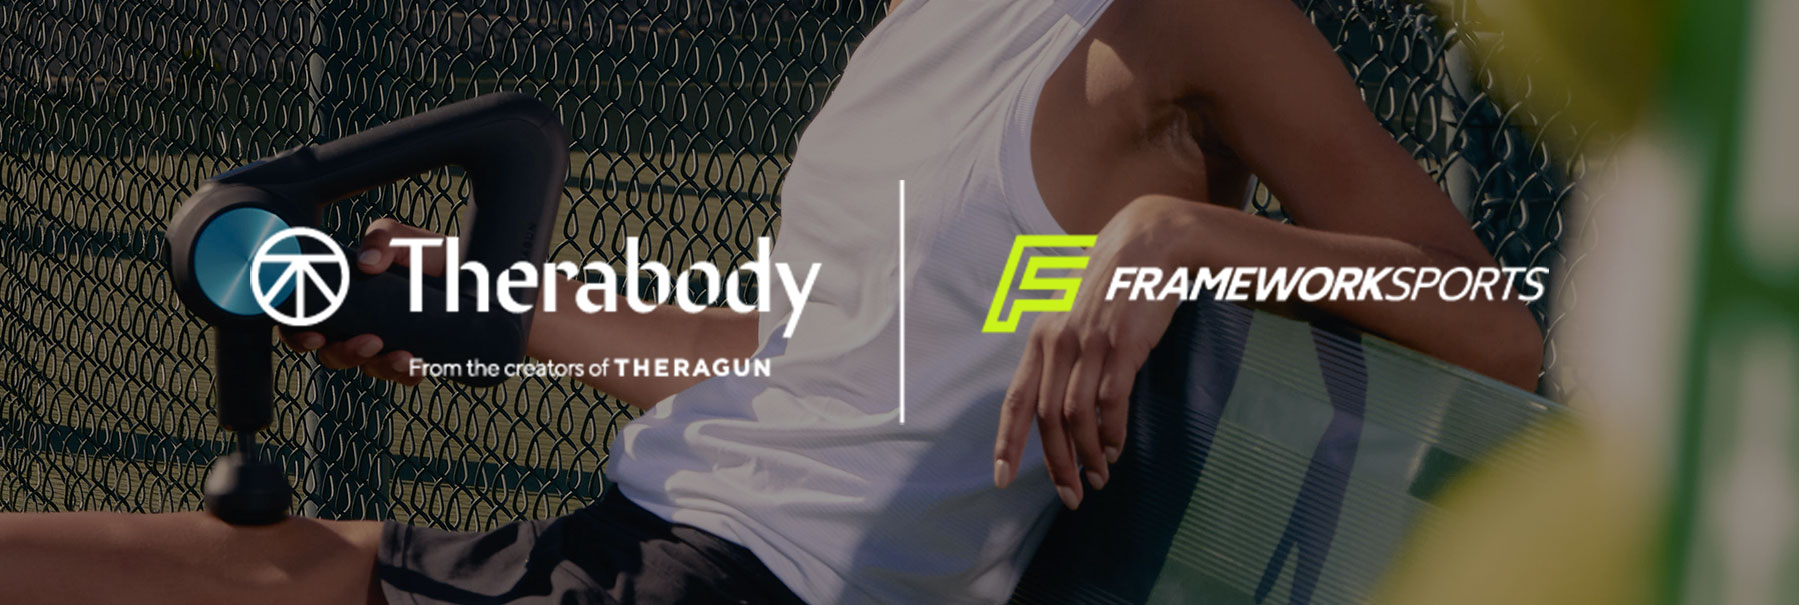 therabody framework partnership banner top